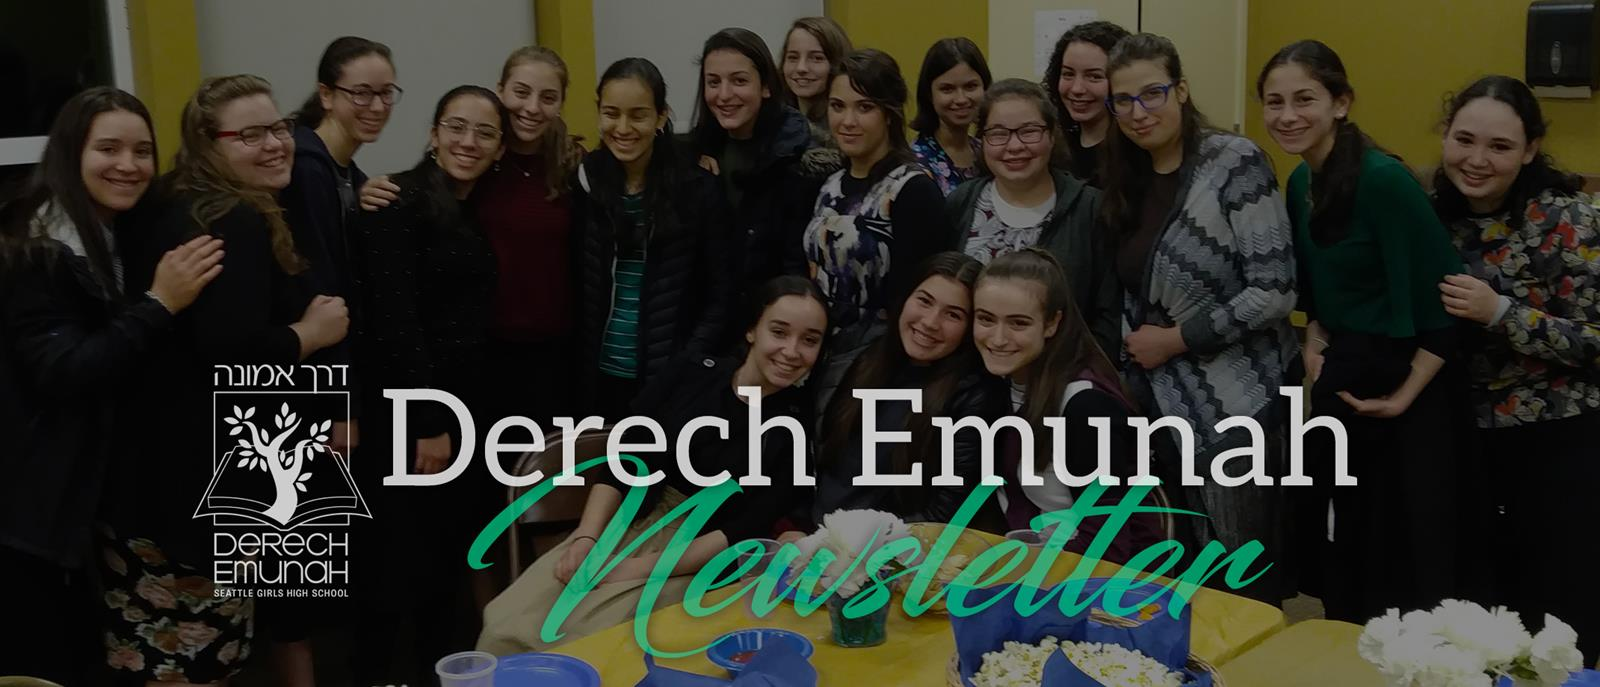 Derech Emunah Newsletter